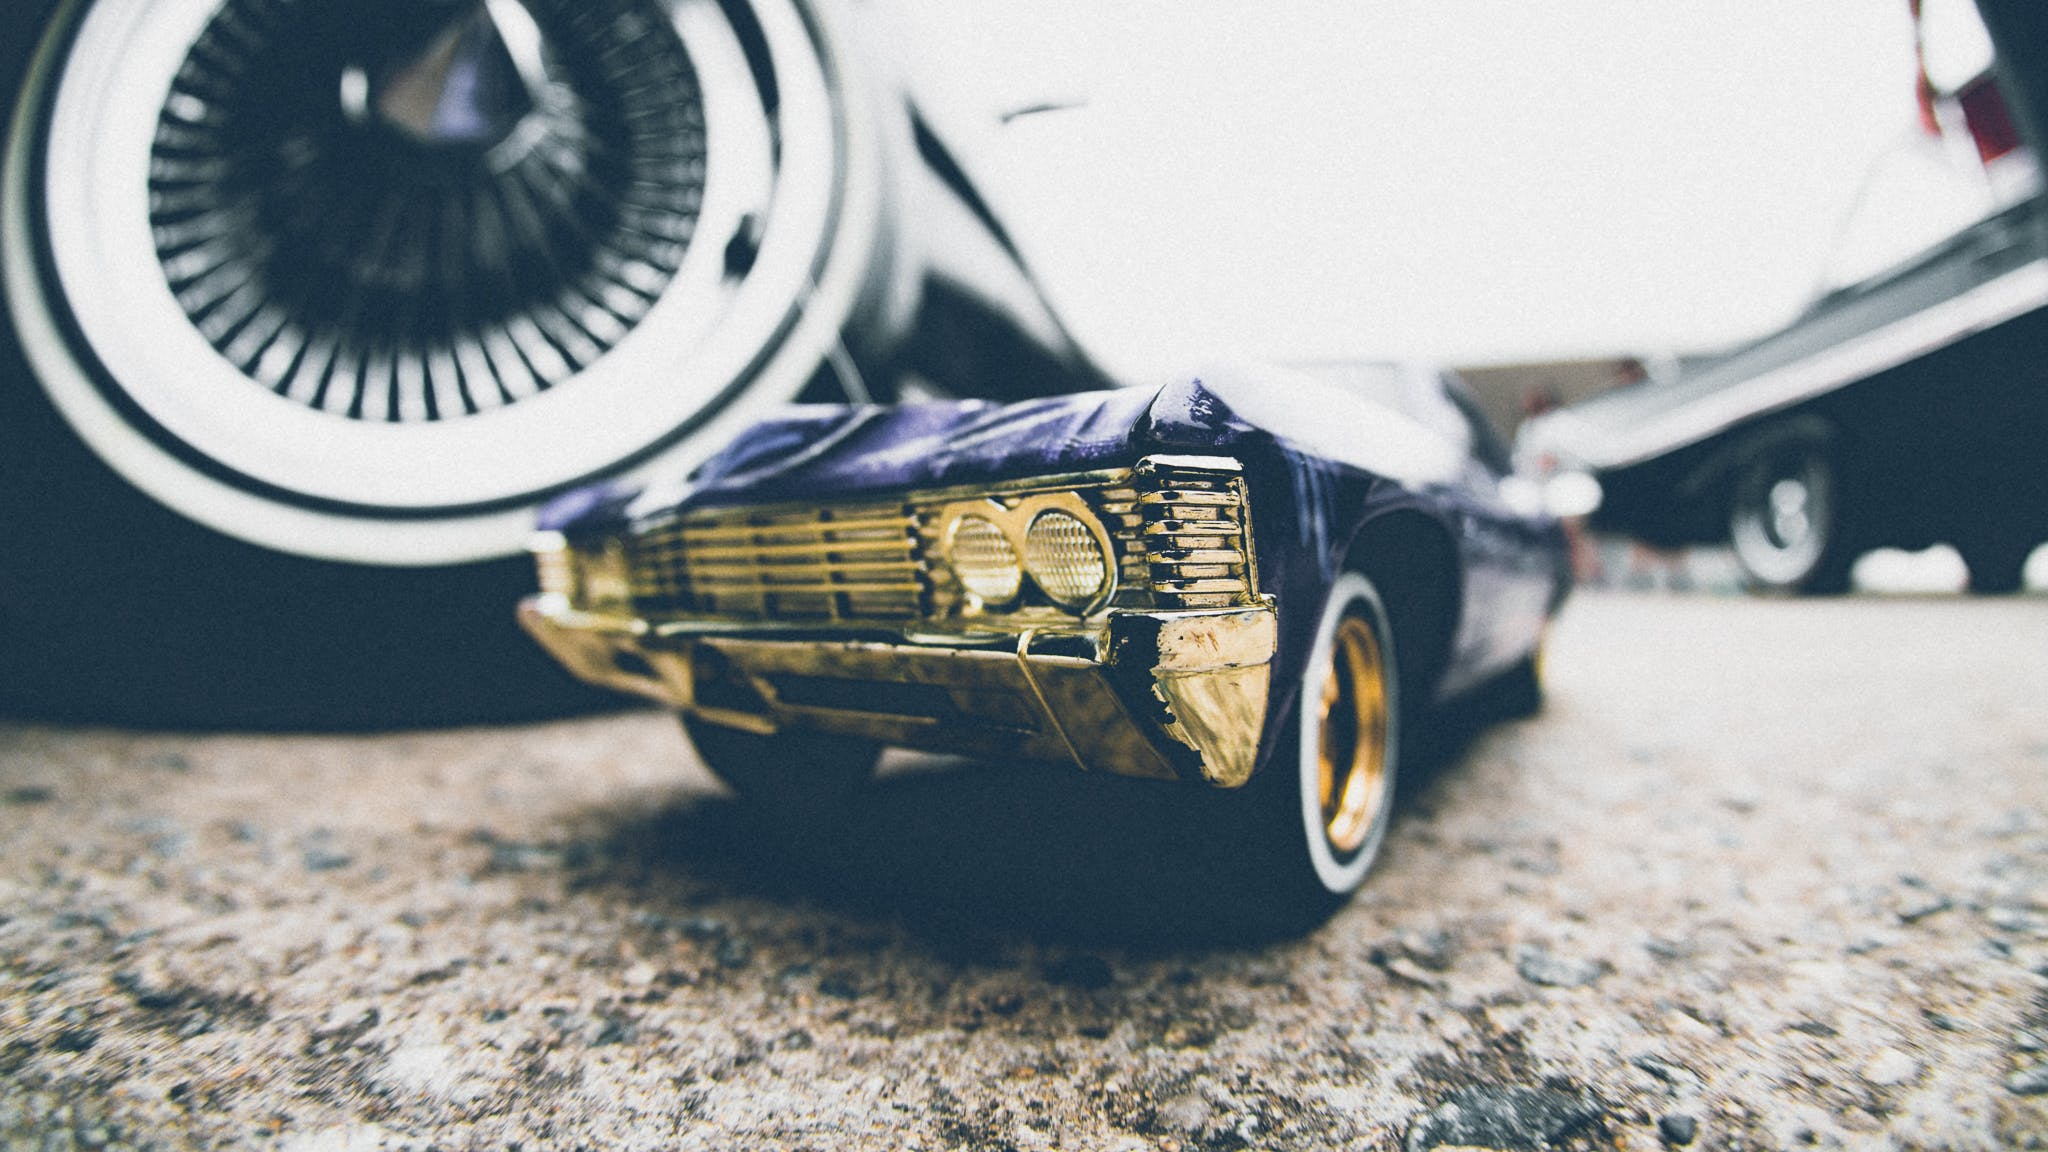 Gratis arkivbilde med biler, chrome, design, fortau